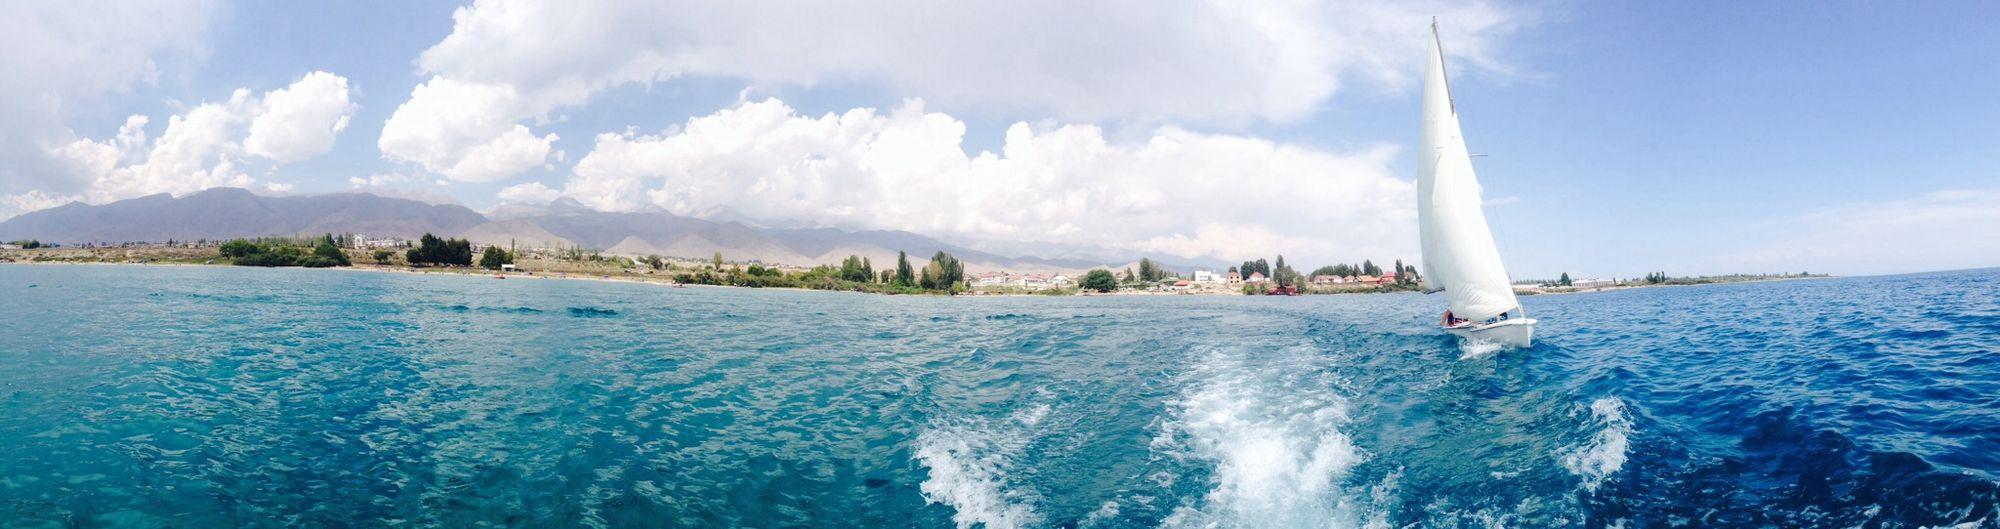 Summer ☀ Waves Lake Beautiful Scene